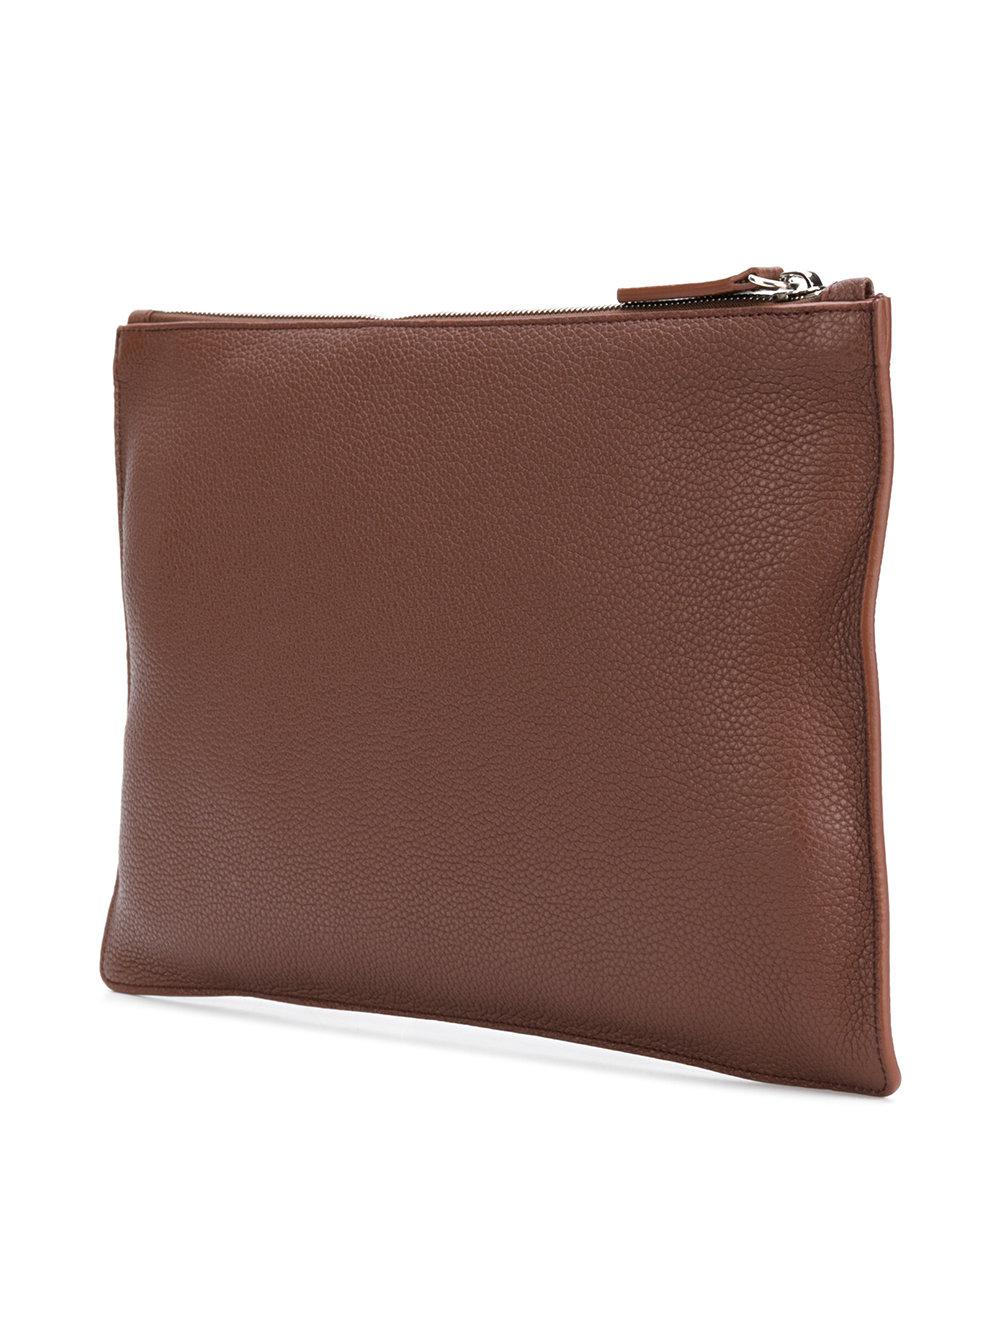 Jil Sander zipped logo clutch - Brown GVmXj9J